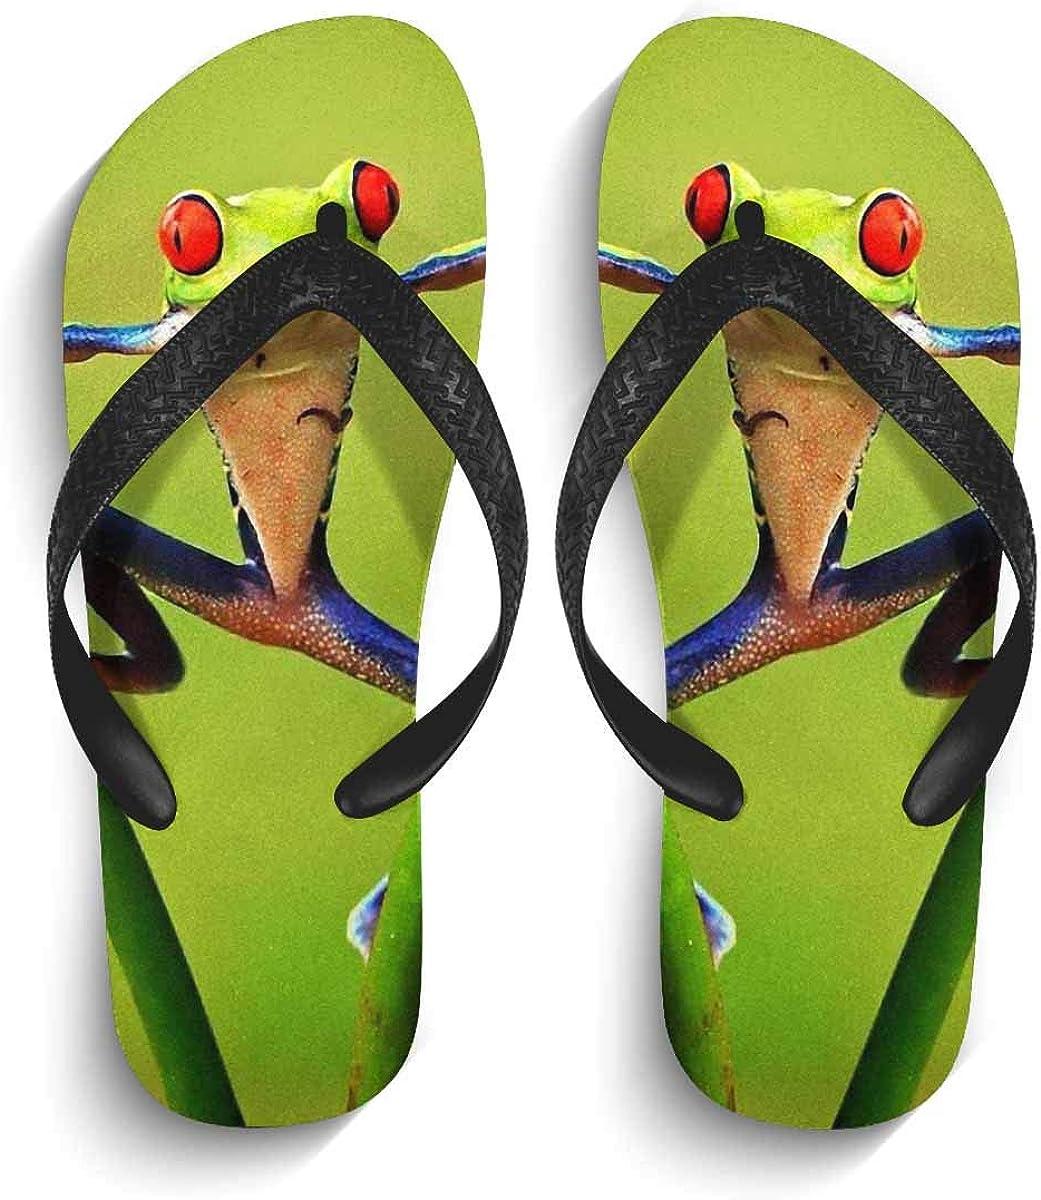 InterestPrint Non-Slip Flip Flops Sandal Cute Frog Lightweight Summer Beach Thong Slippers for Men S